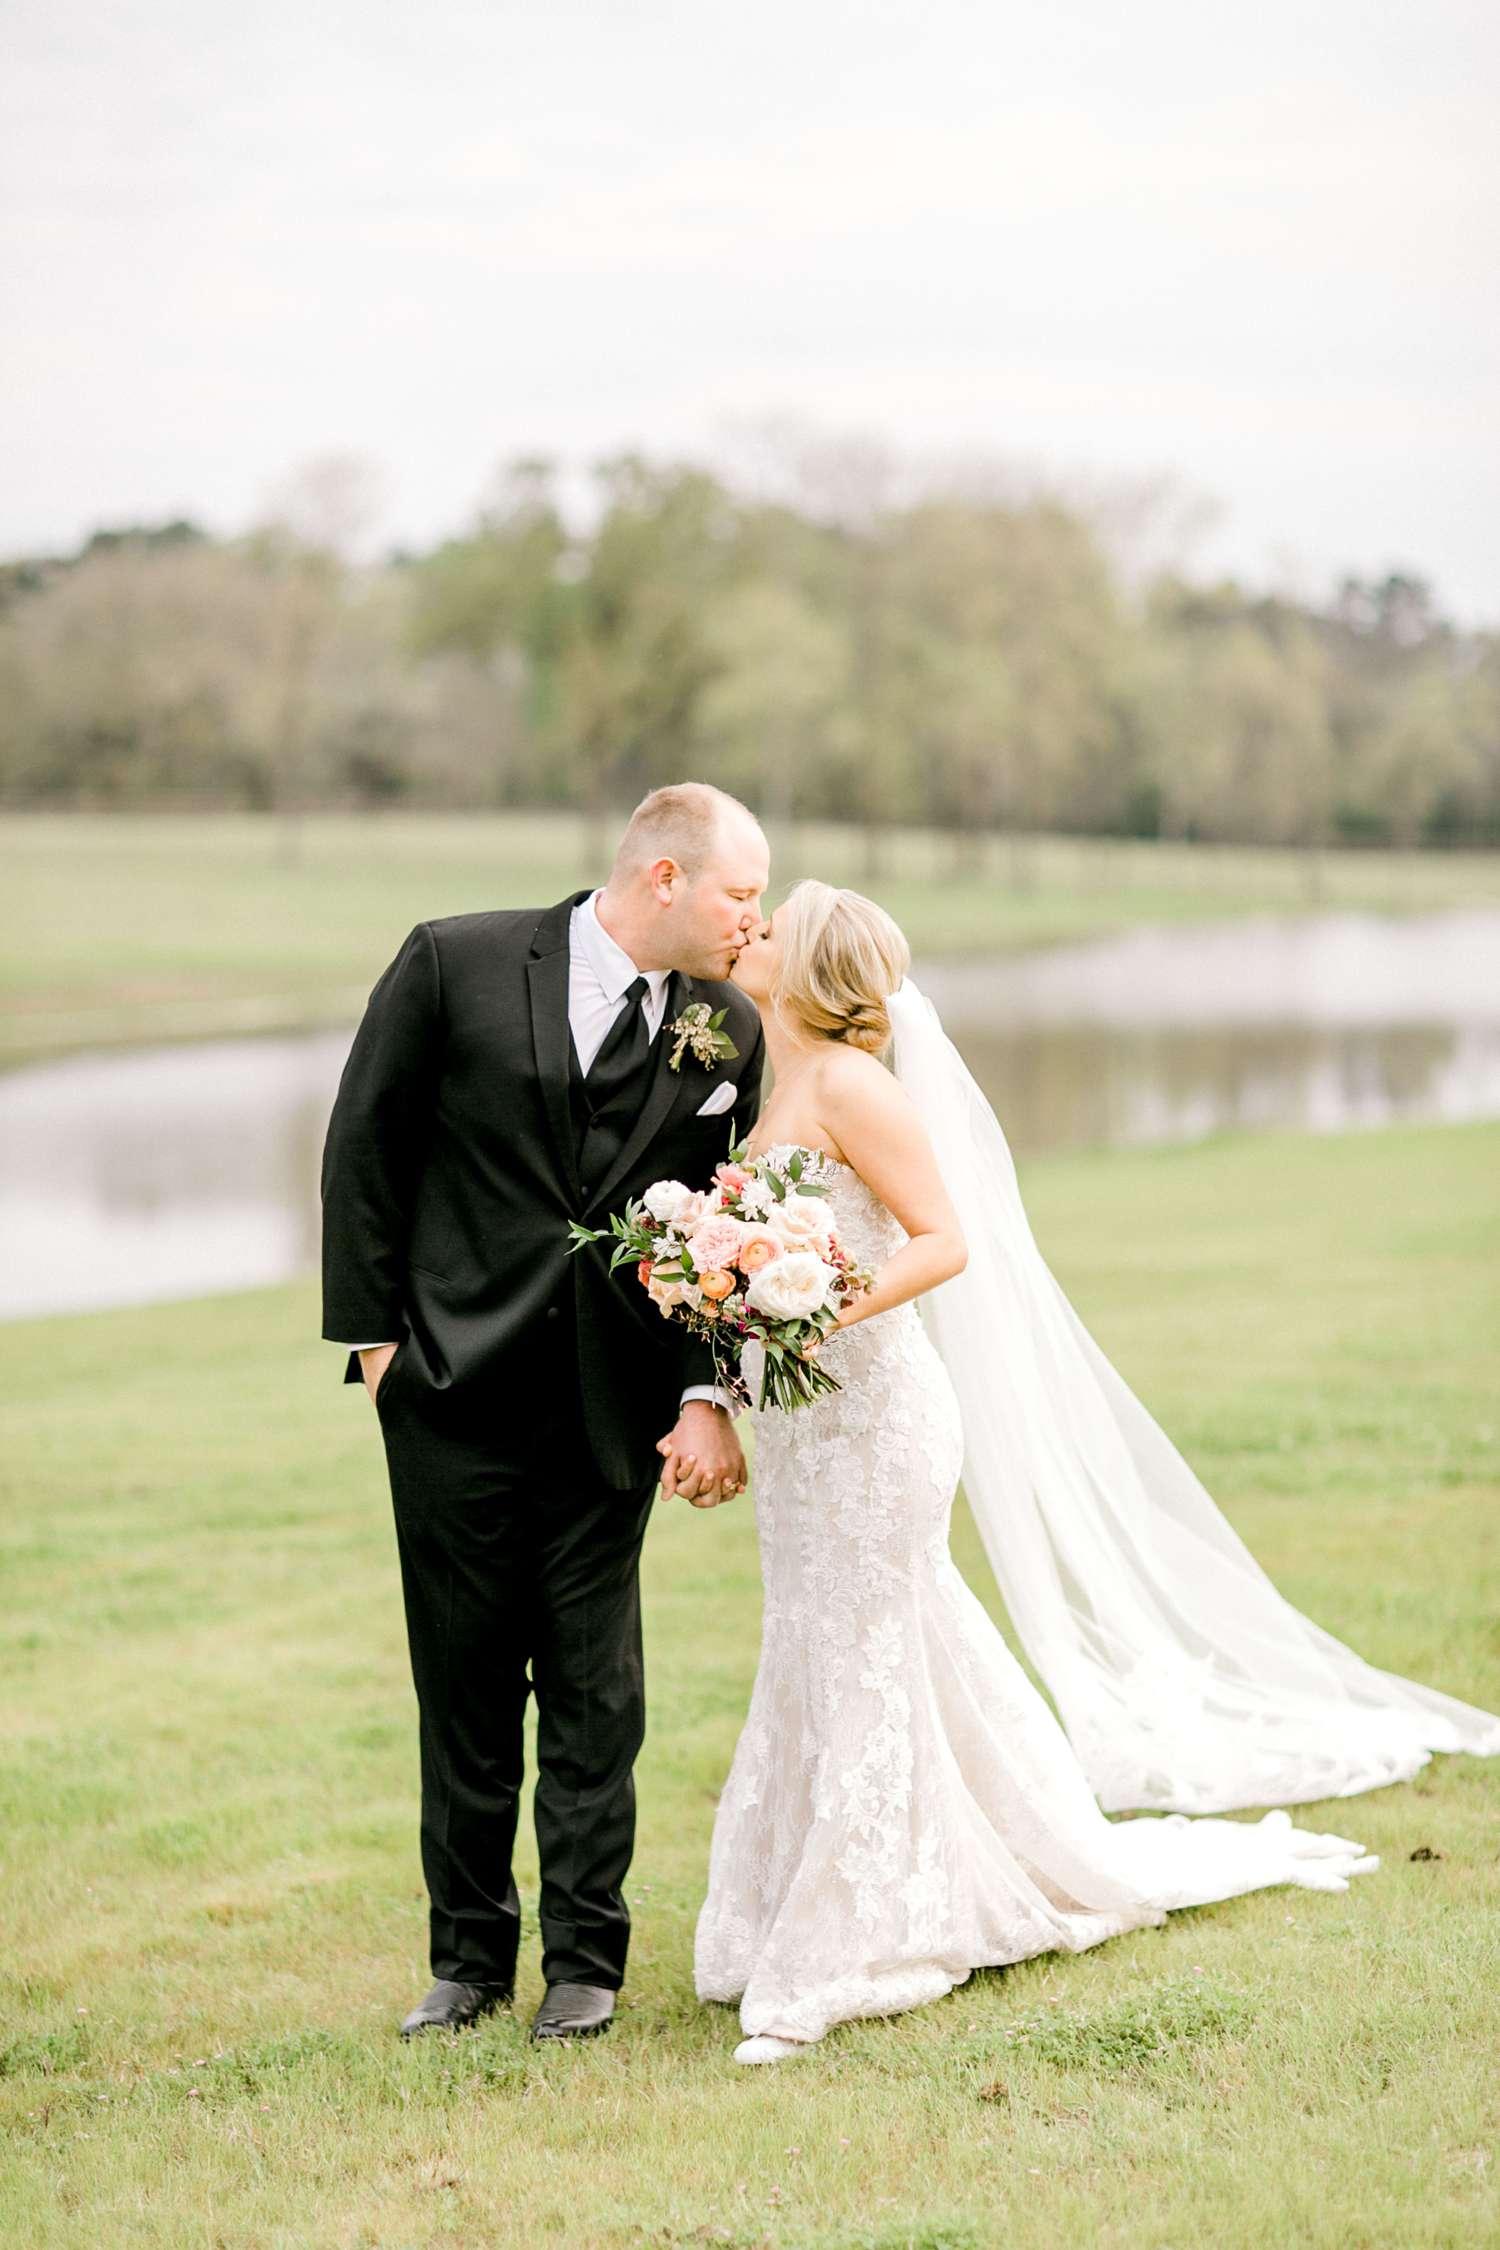 HEBERT_MORGAN_AND_CLAY_ALLEEJ_THE_FARMHOUSE_MONTGOMERY_TEXAS_WEDDING_0136.jpg